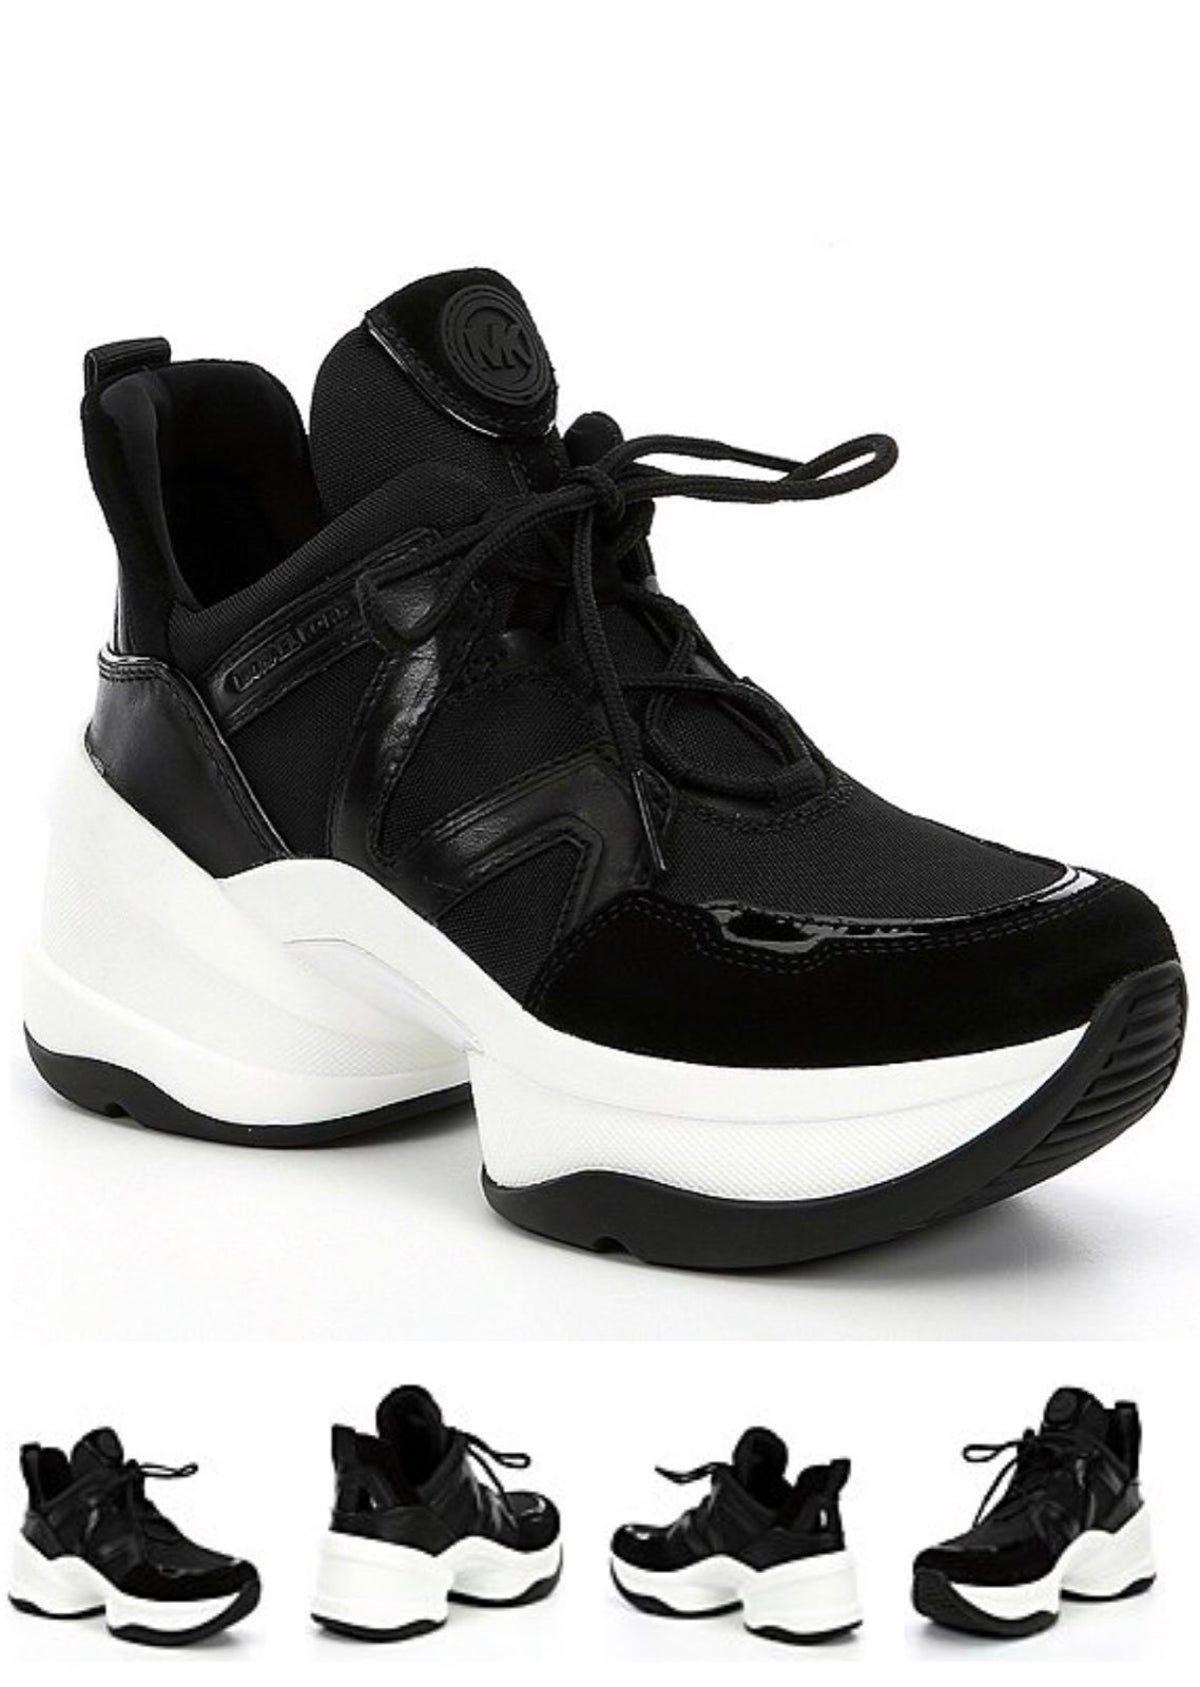 michael kors shoes in 2020 | Michael